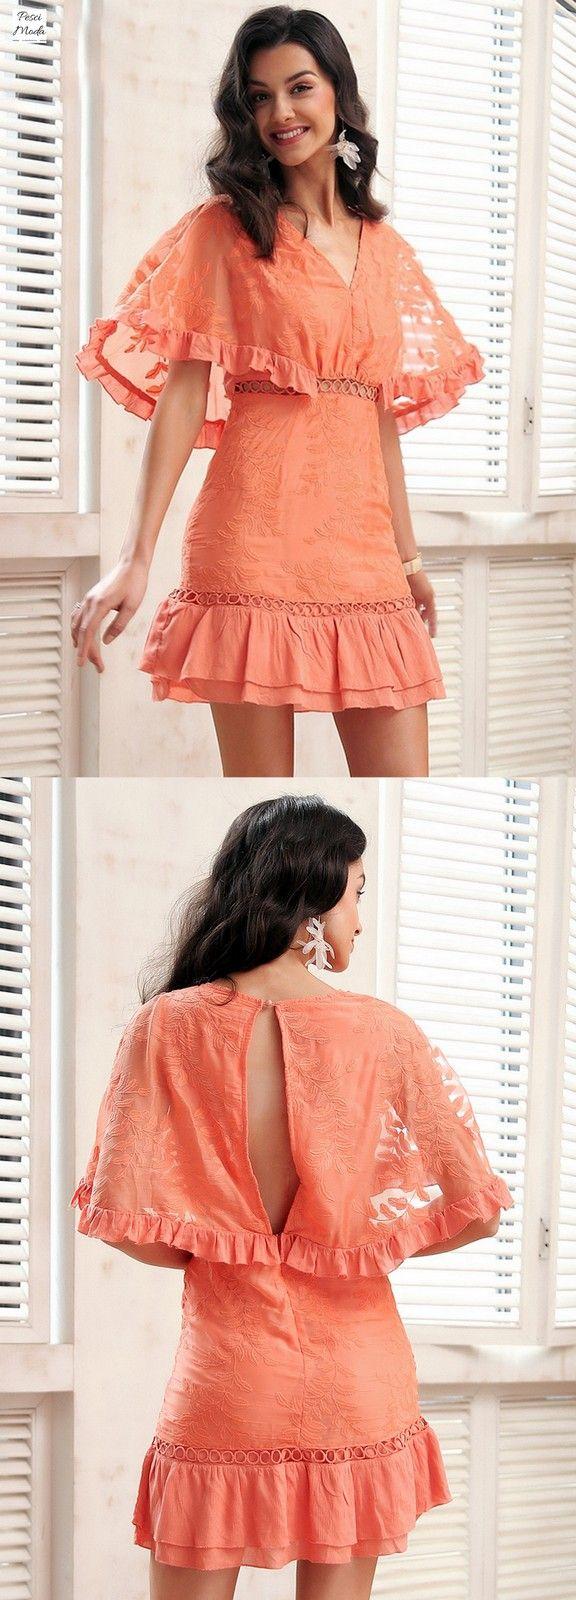 off plus free shipping hottest prom dresses minidresses